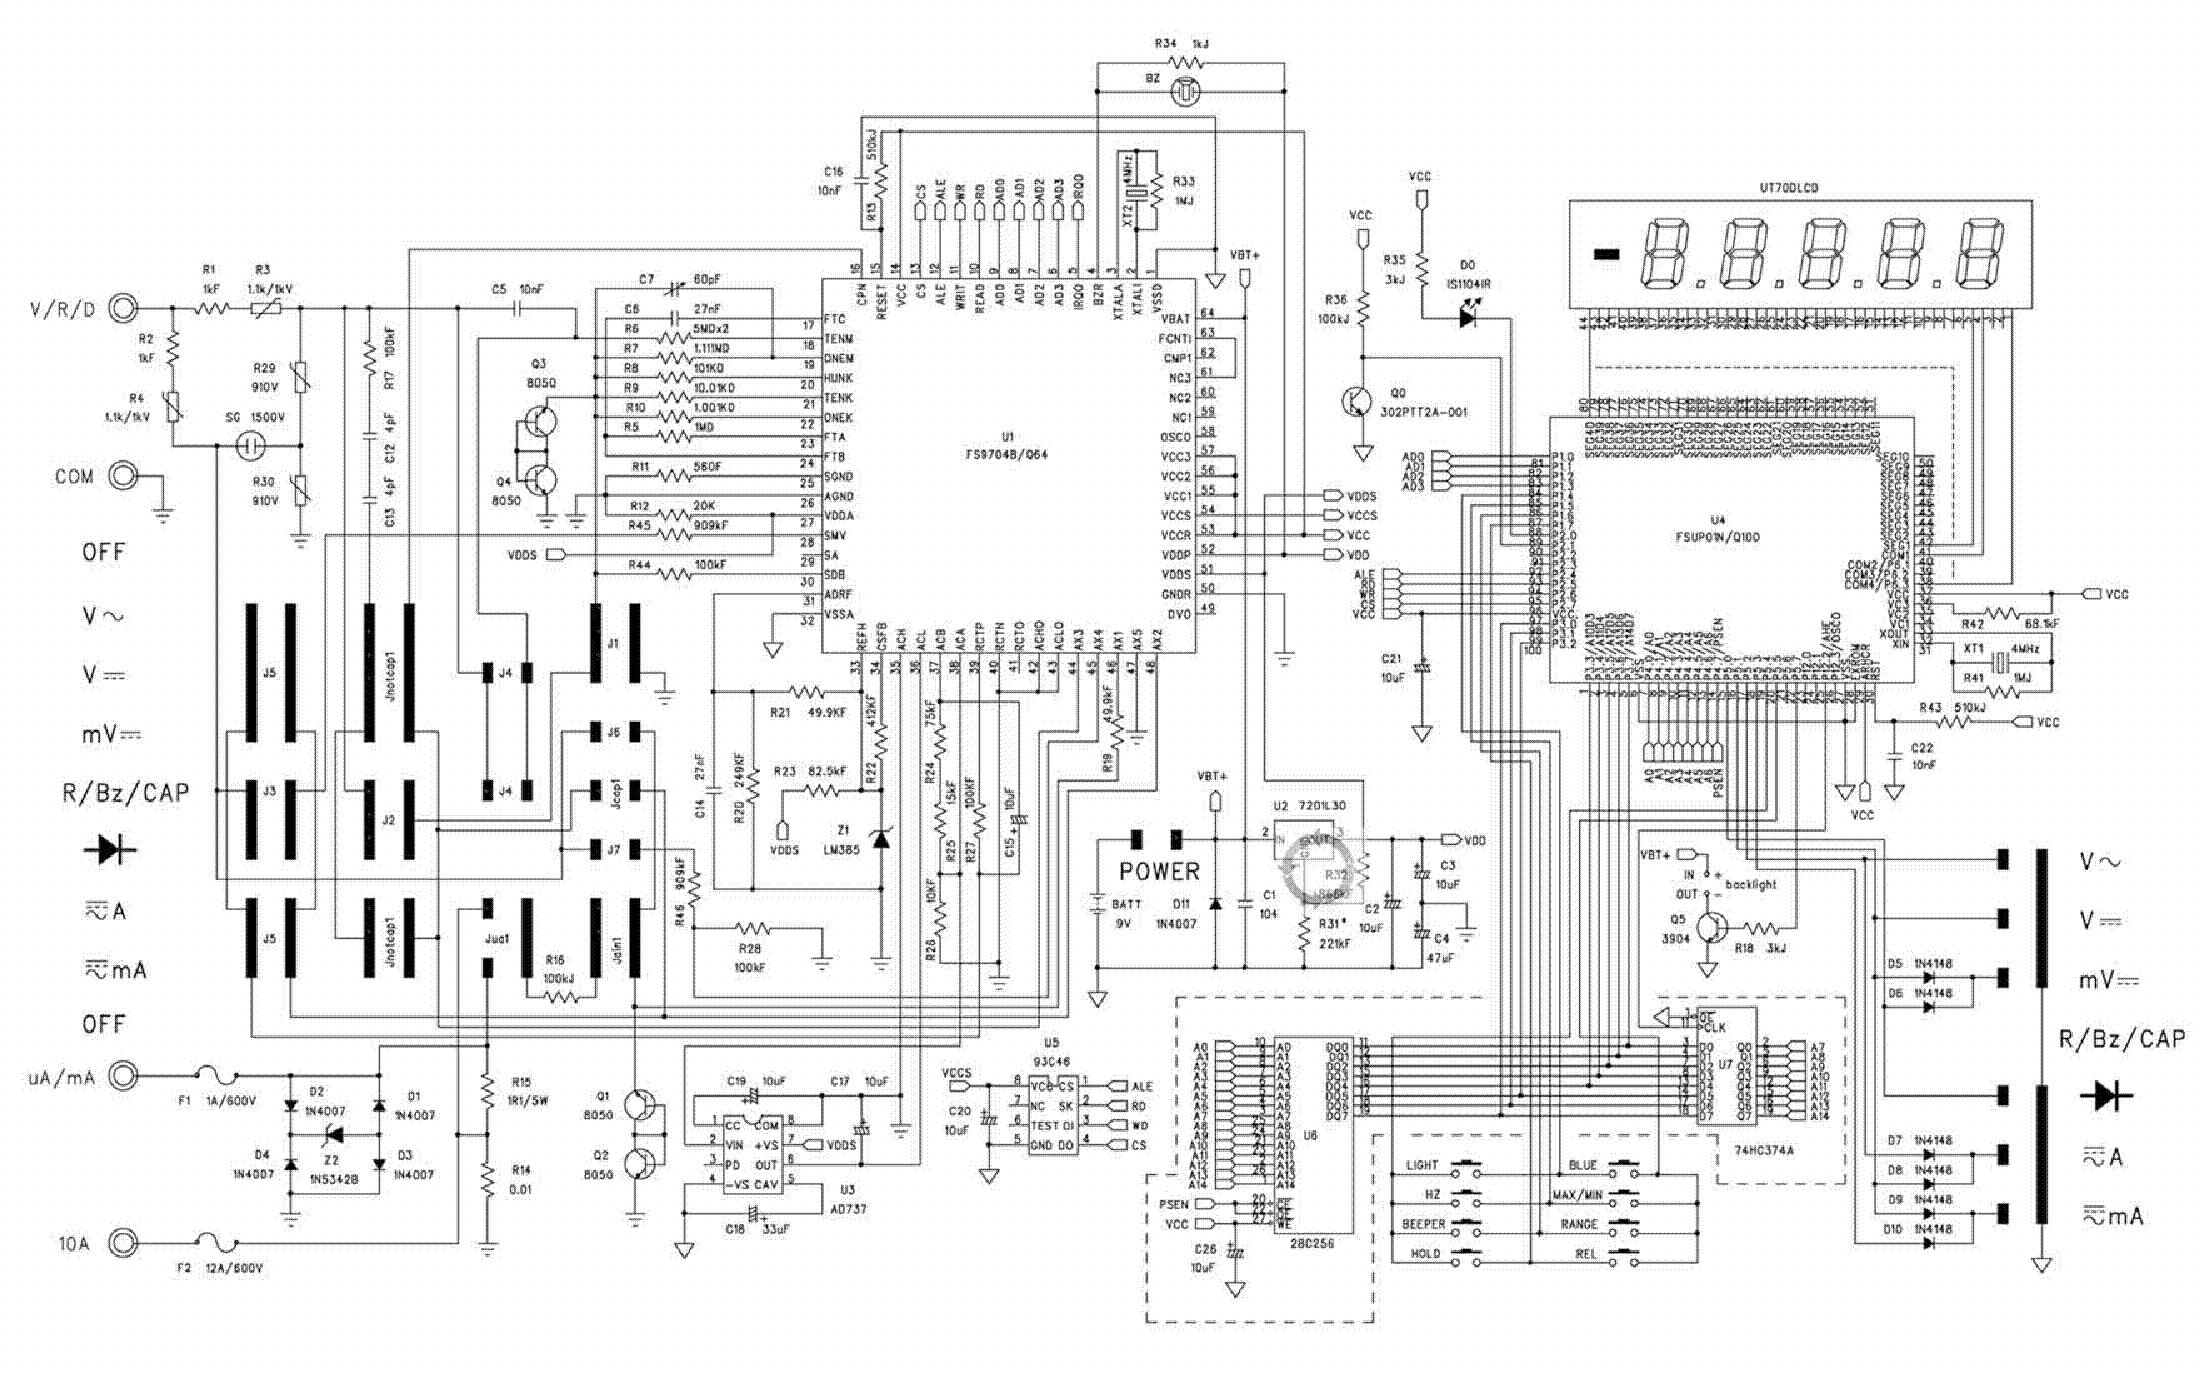 multimeter ut70d sch service manual download  schematics  eeprom  repair info for electronics